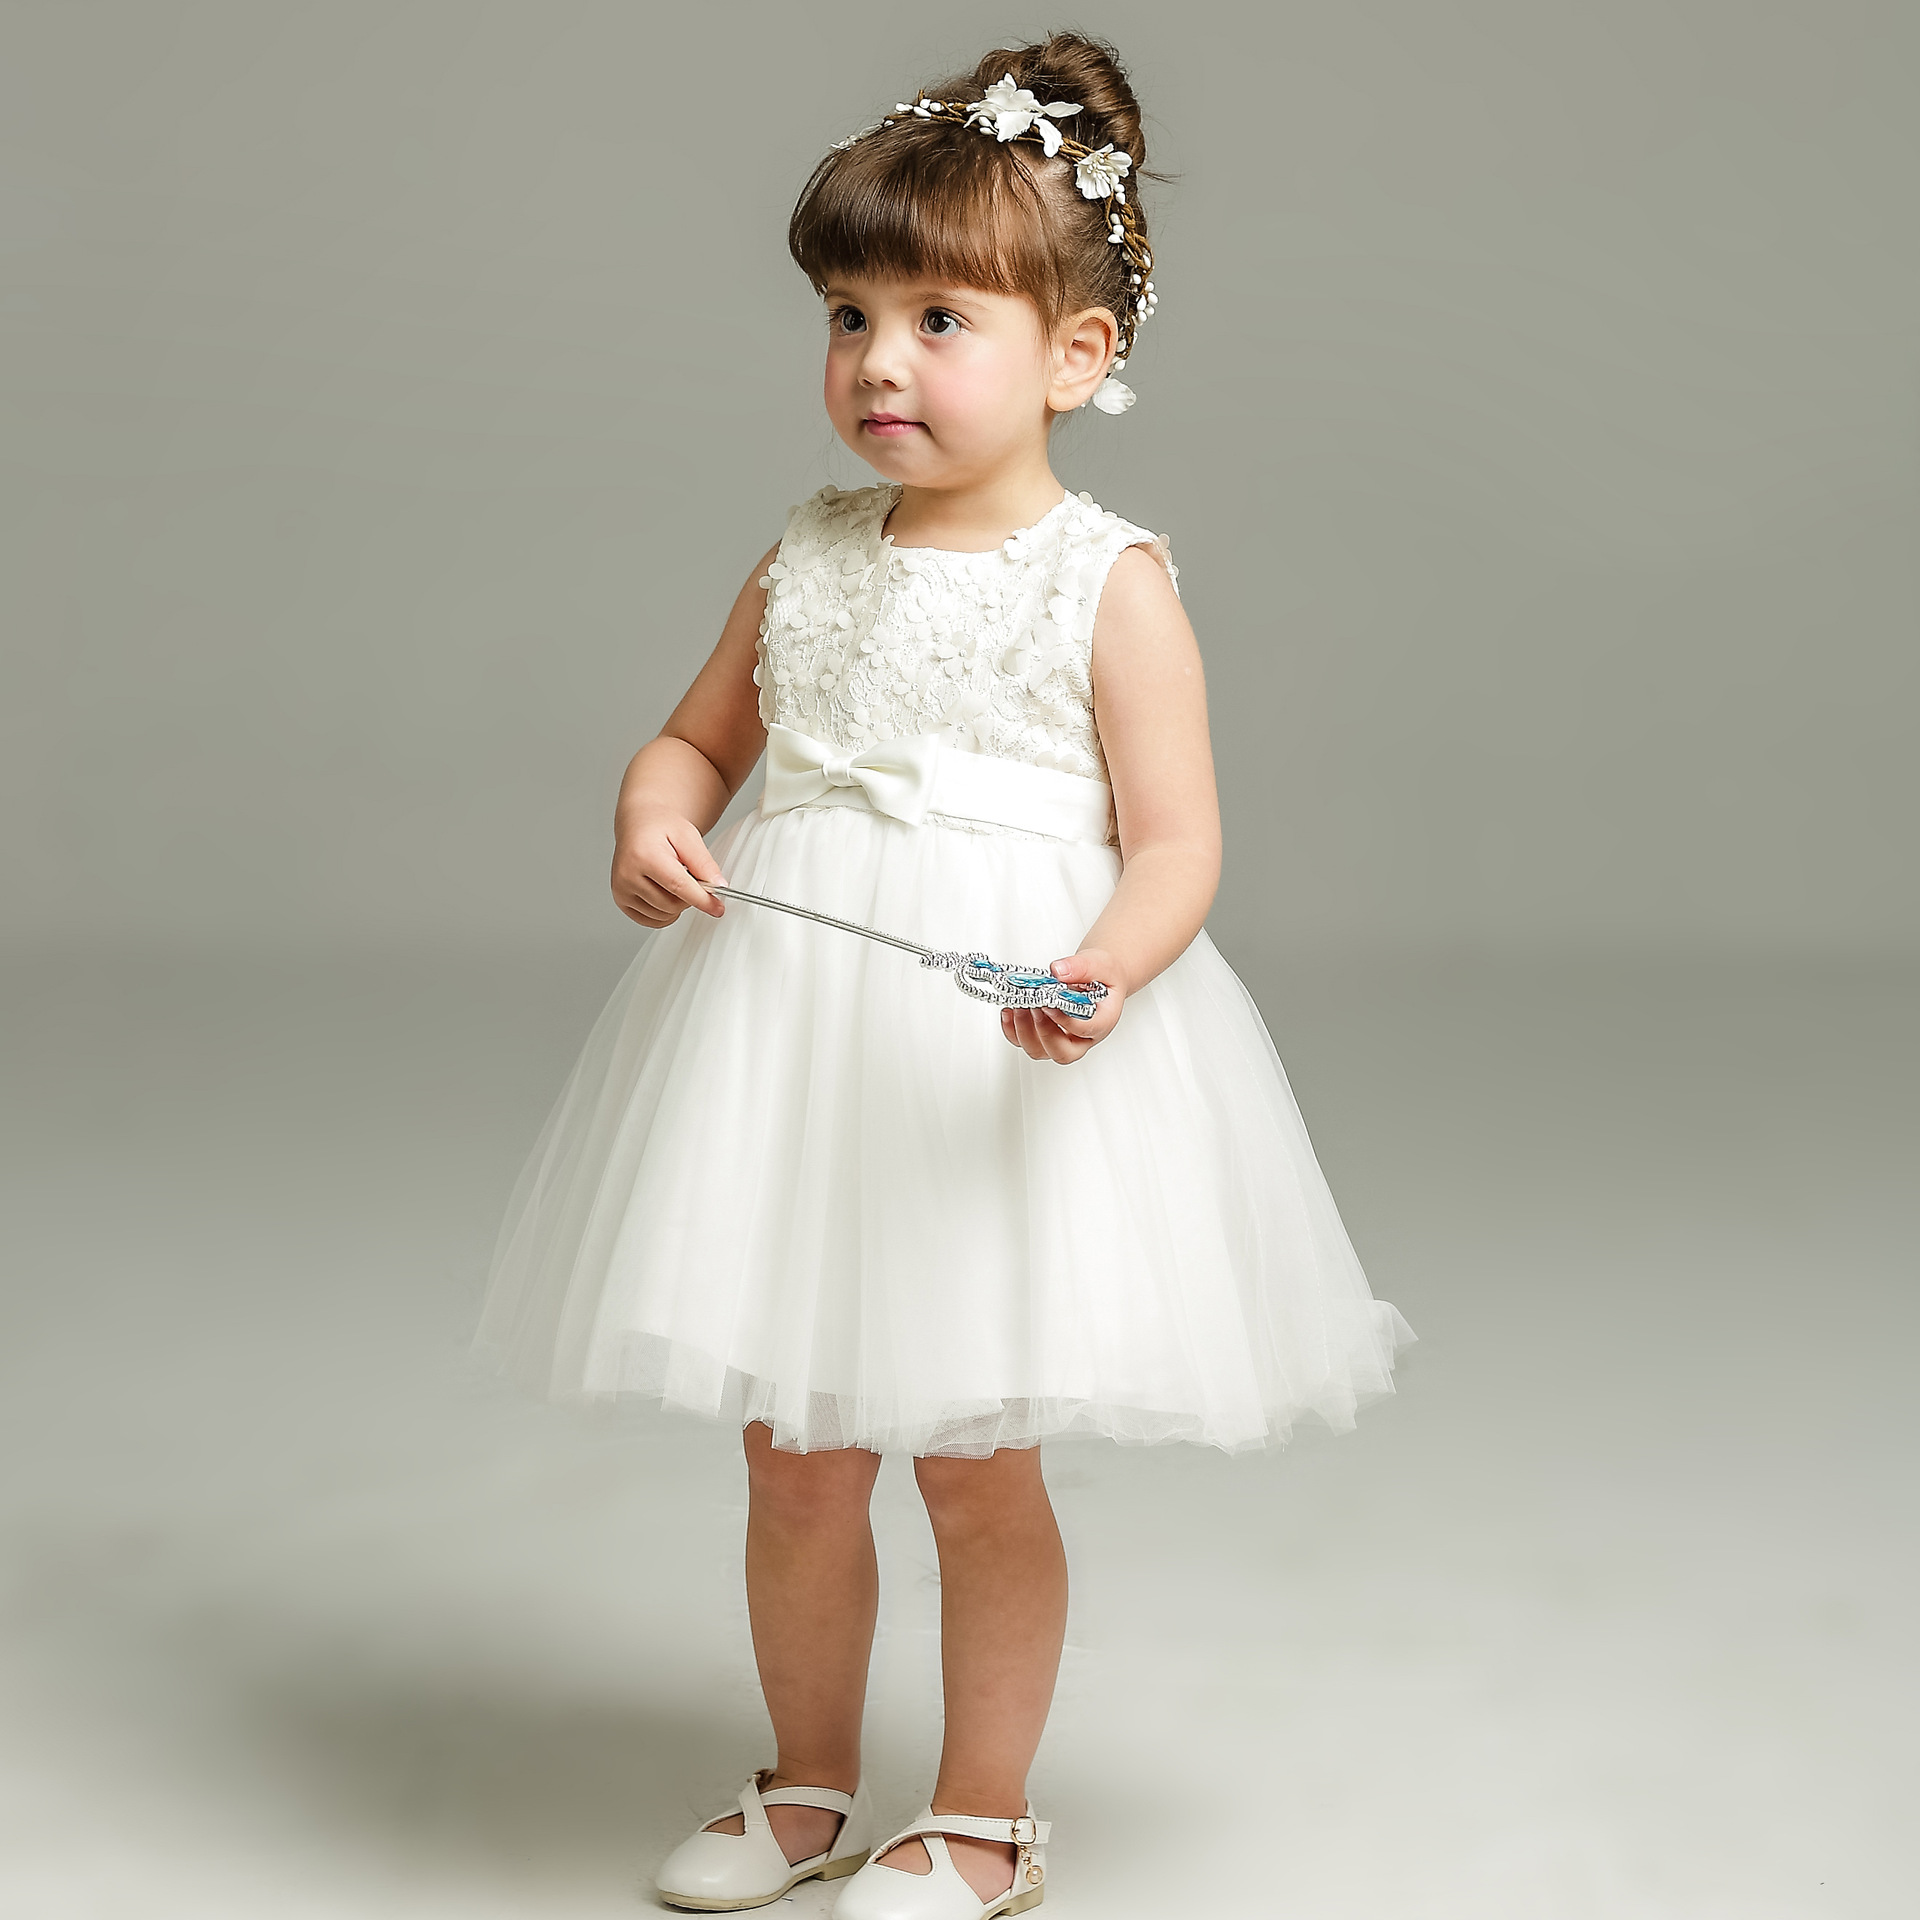 Toddler Infant Kids Baby Girls Lace Strap Floral Dress Clothes Princess Casual Dresses Dream Room Dresses